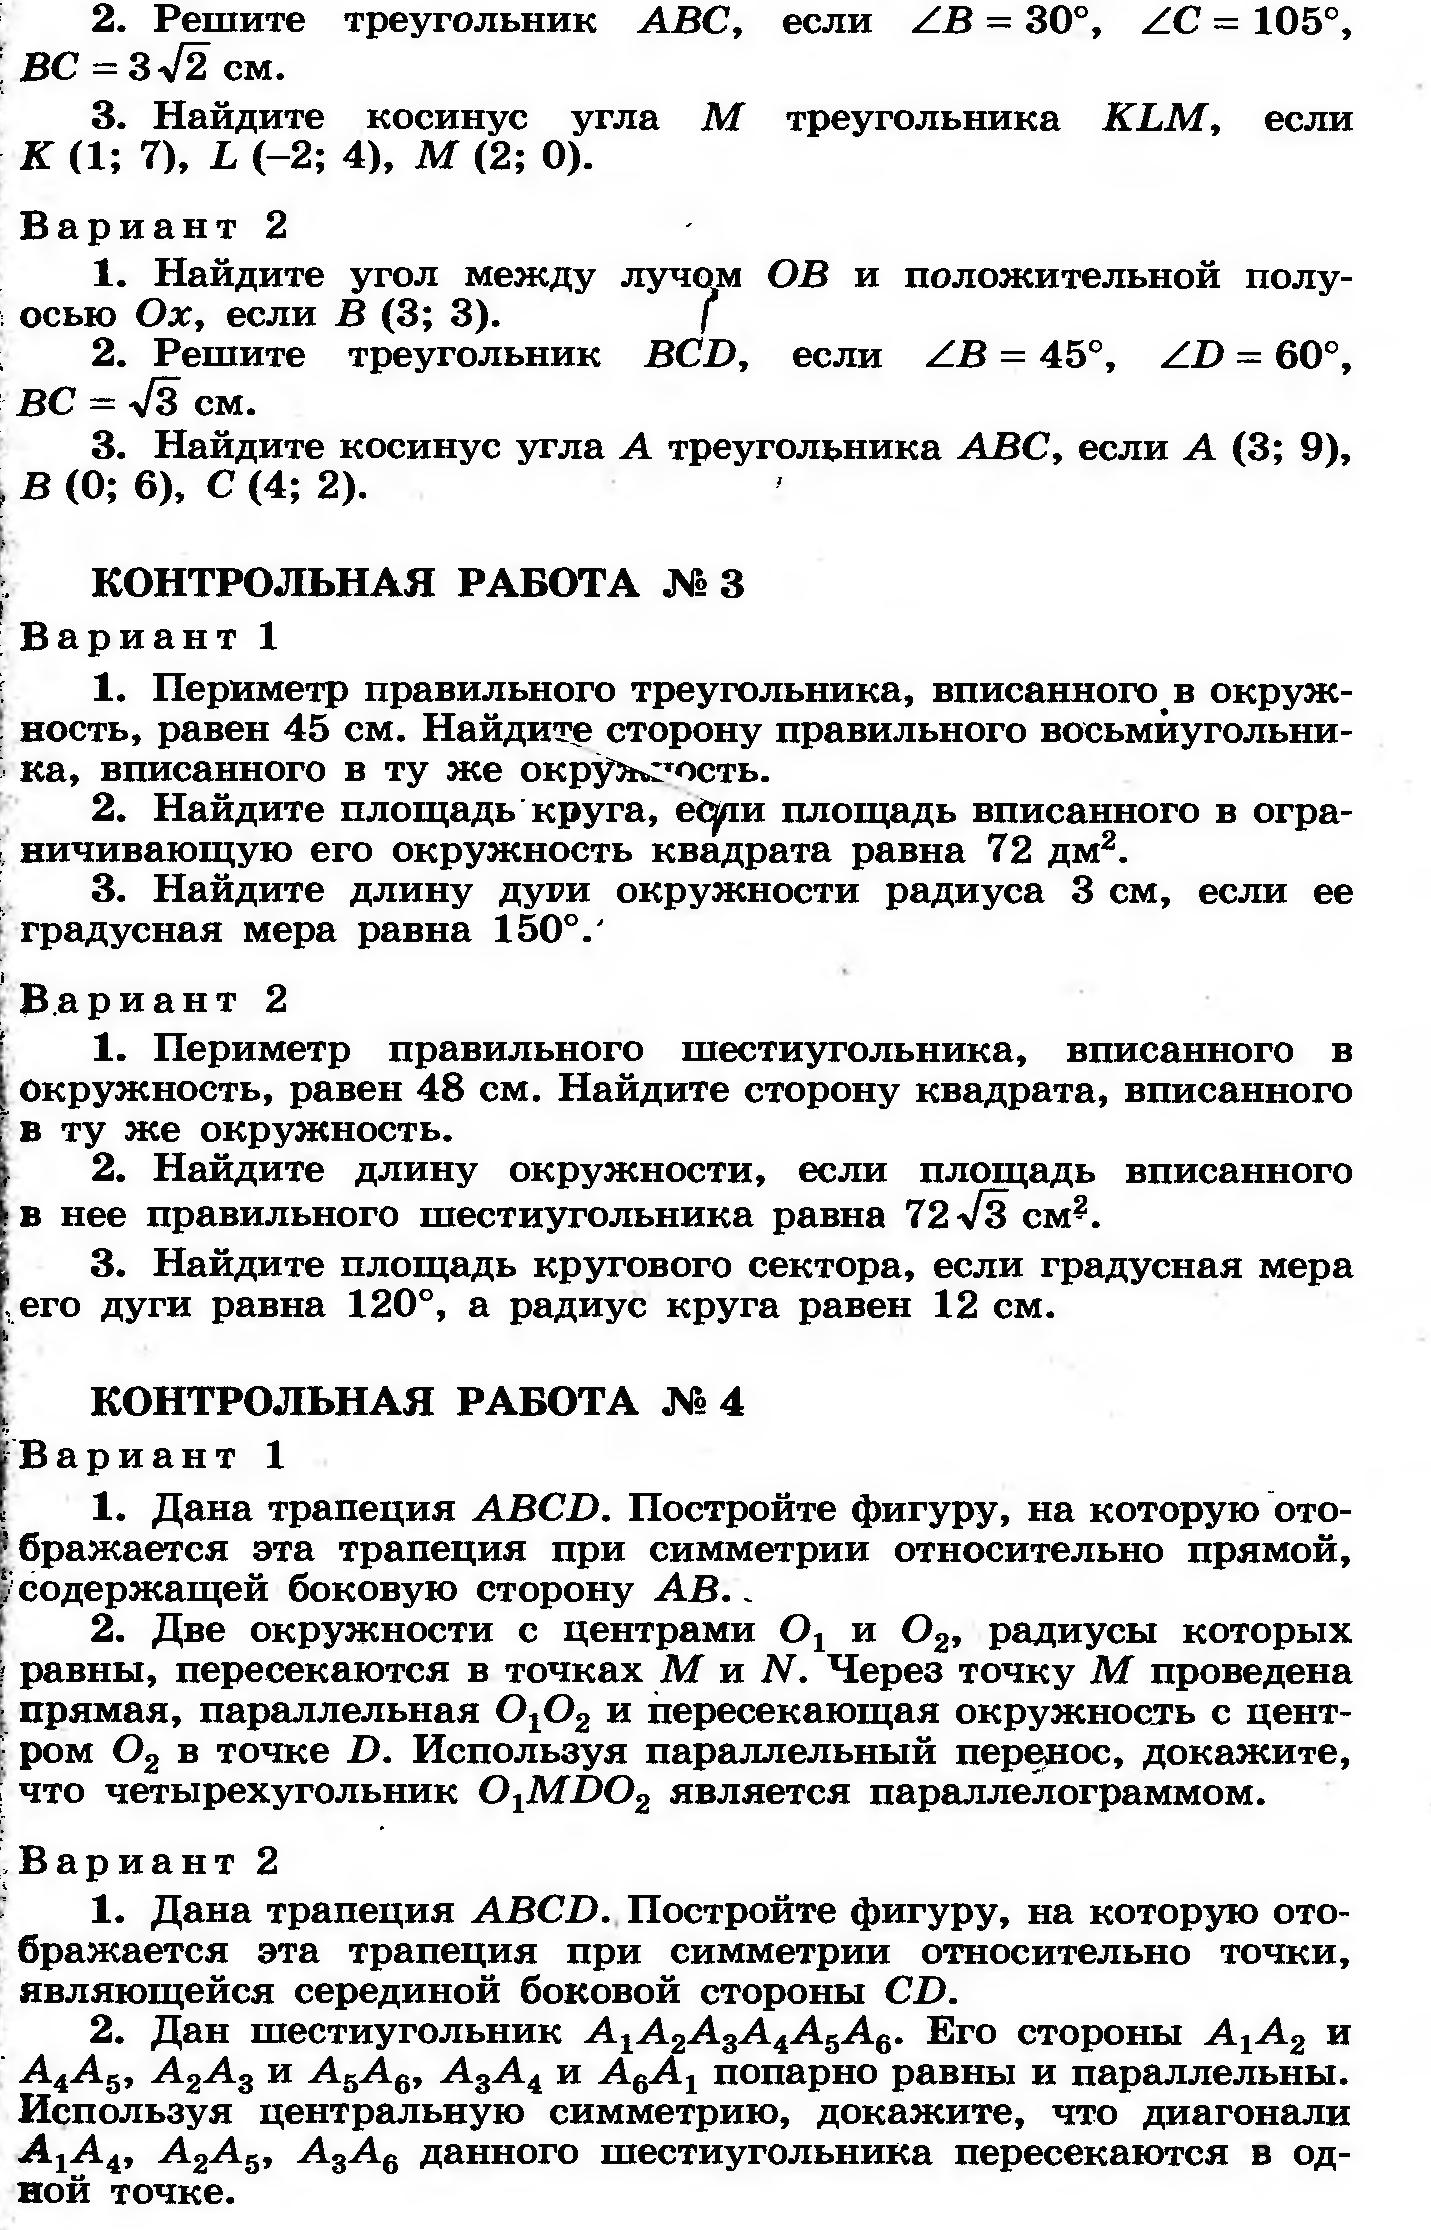 C:\Users\Admin\Documents\p0022 - копия.bmp